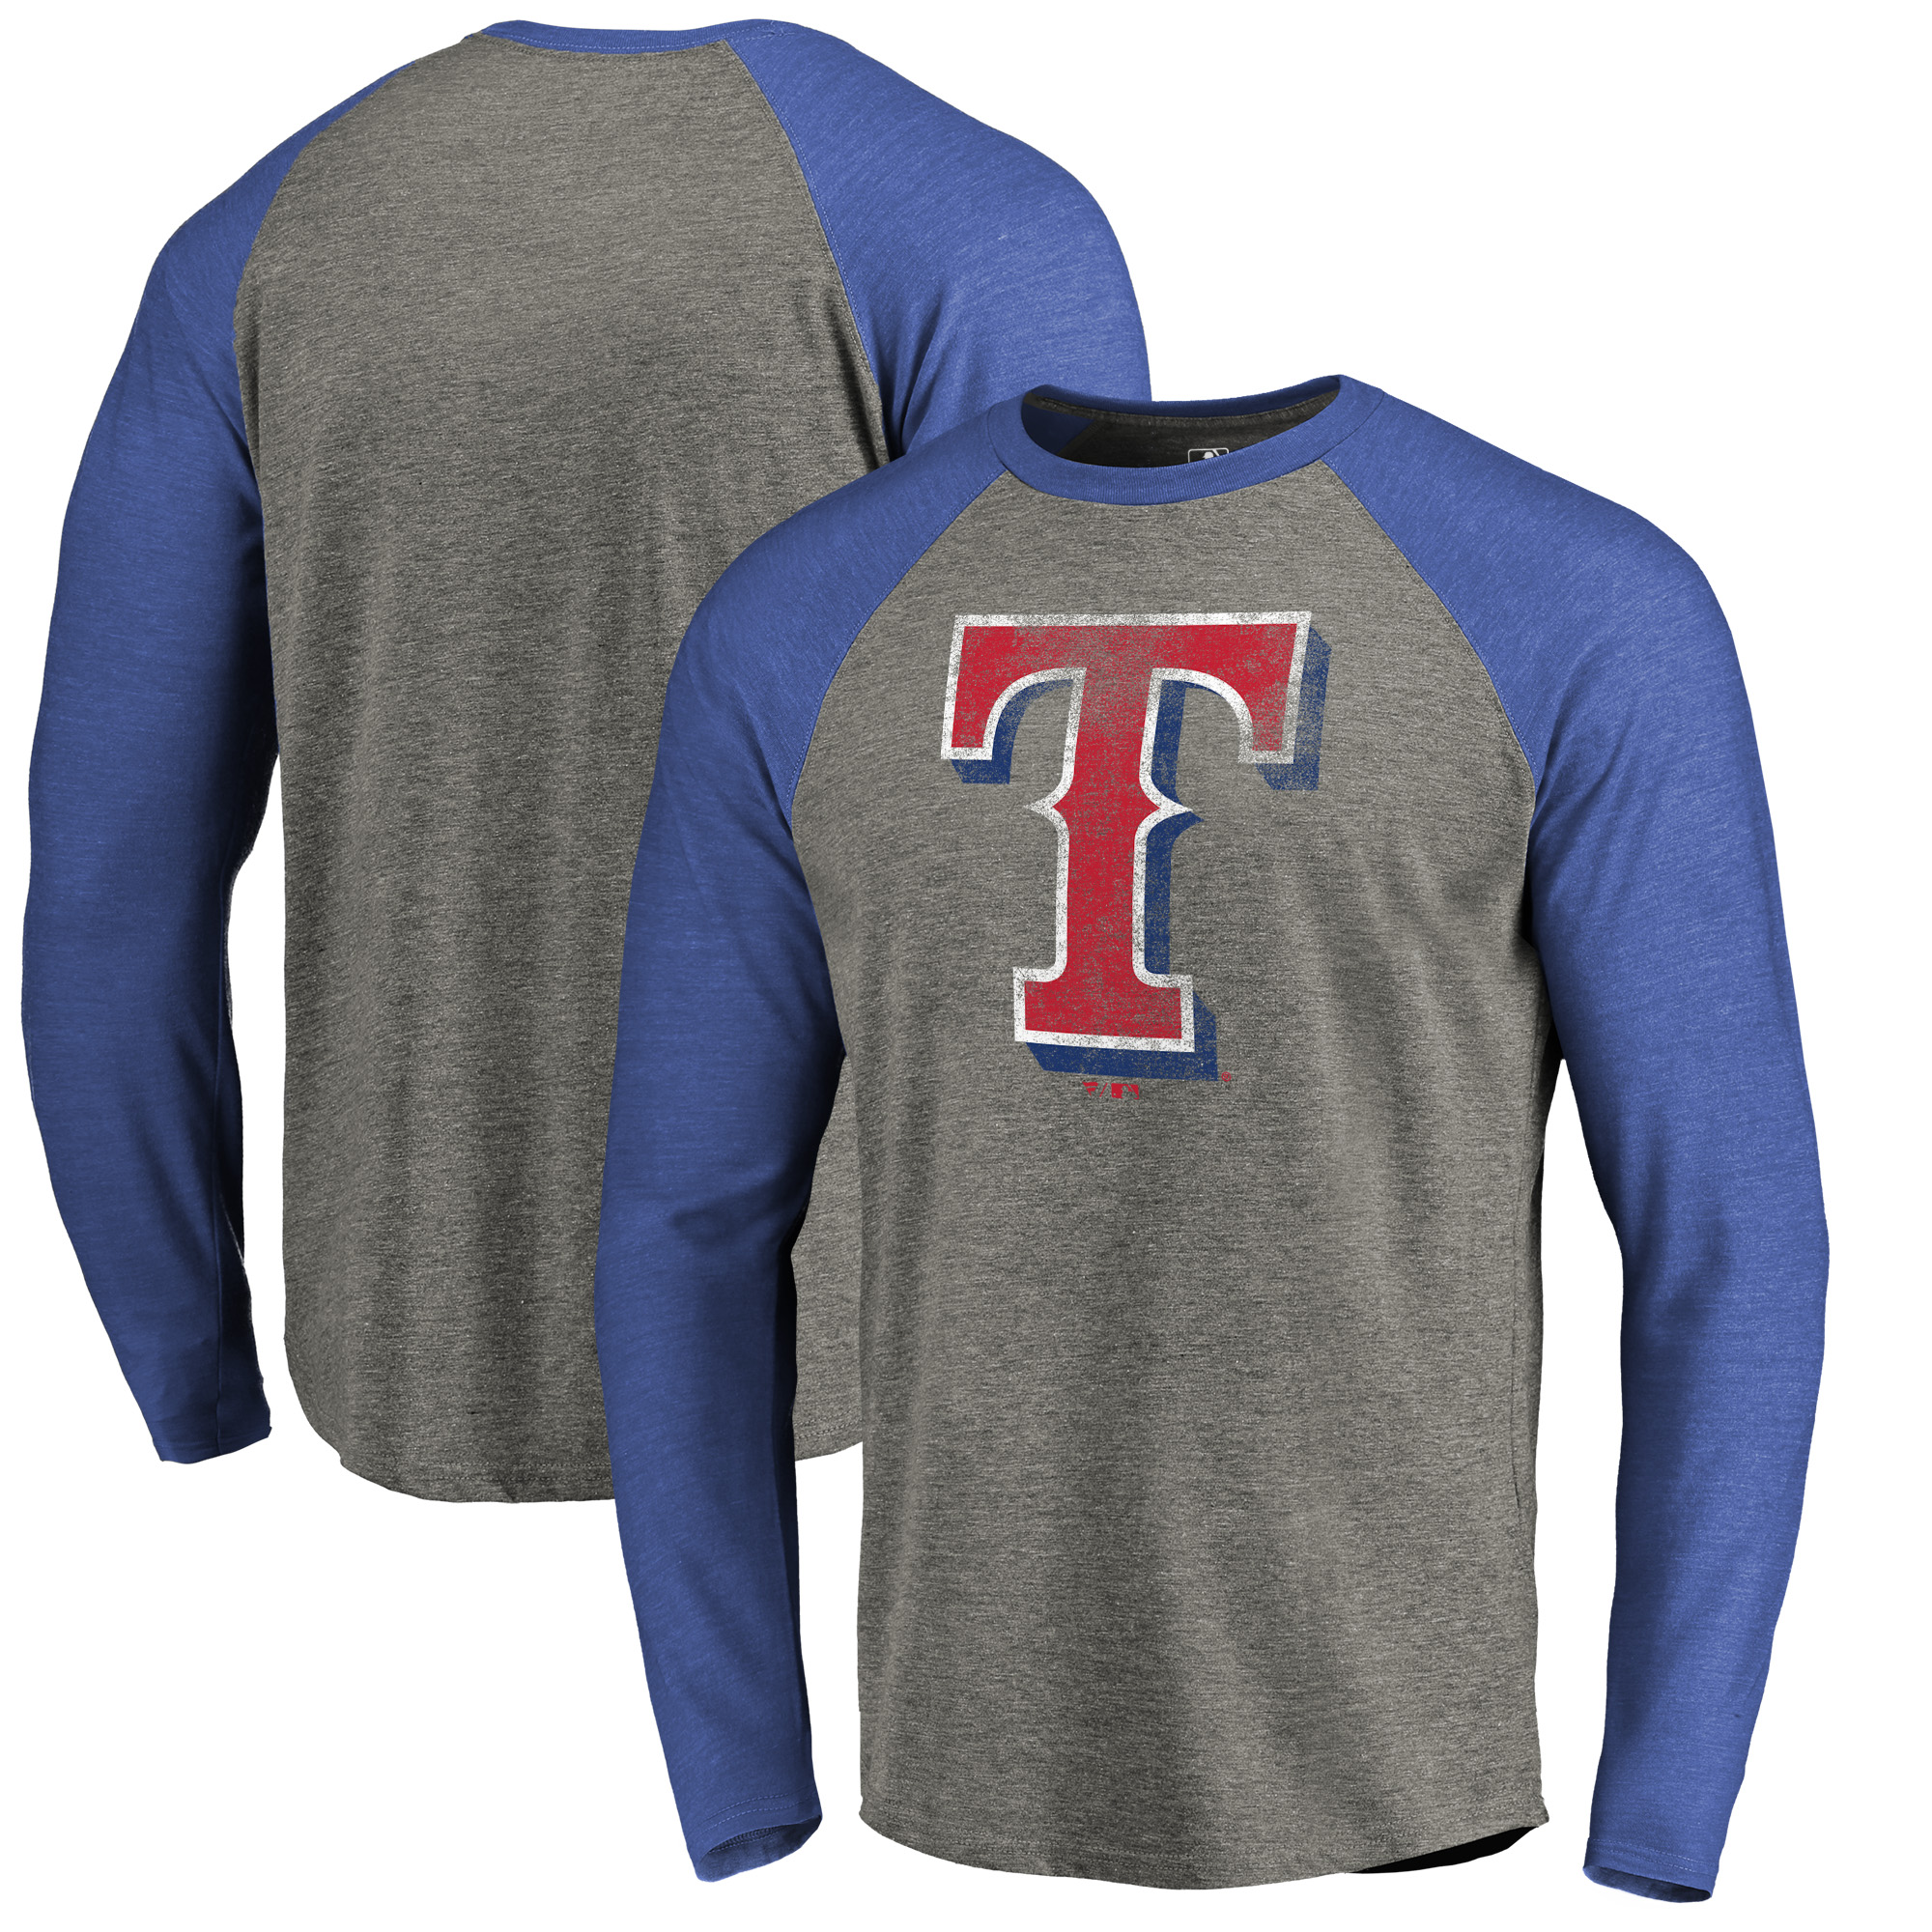 Texas Rangers Fanatics Branded Distressed Team Big & Tall Long Sleeve Tri-Blend Raglan T-Shirt - Gray/Royal